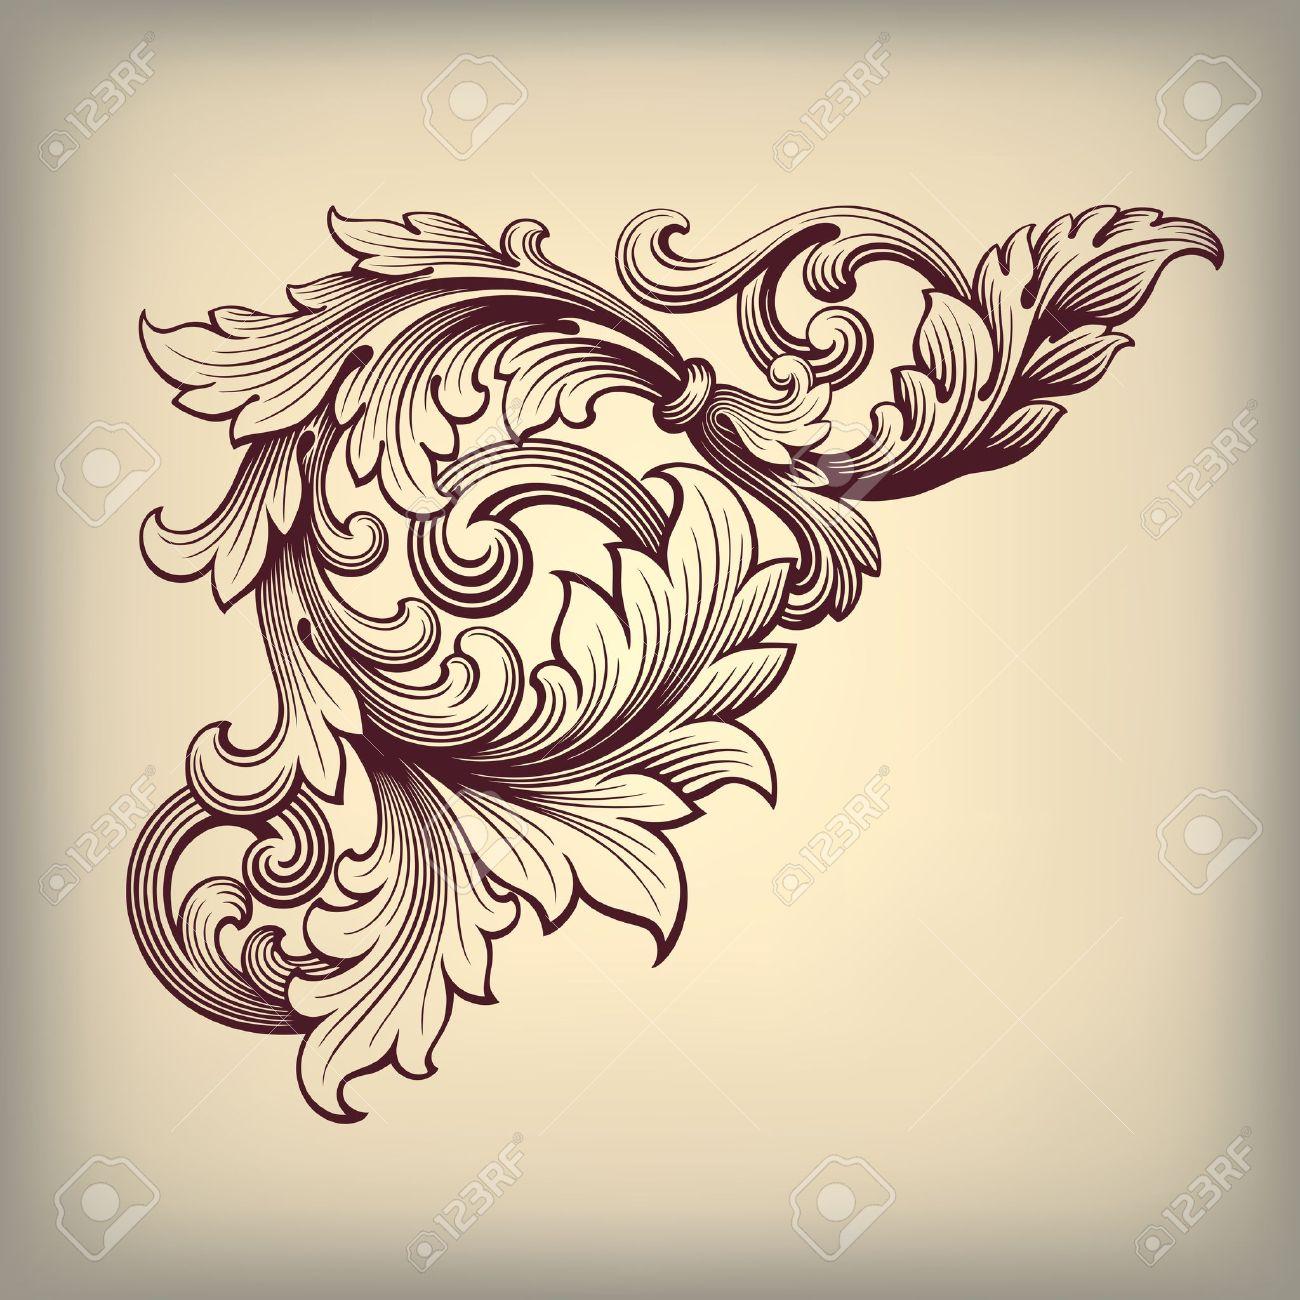 vector vector vintage baroque scroll design frame corner pattern element engraving retro style ornament